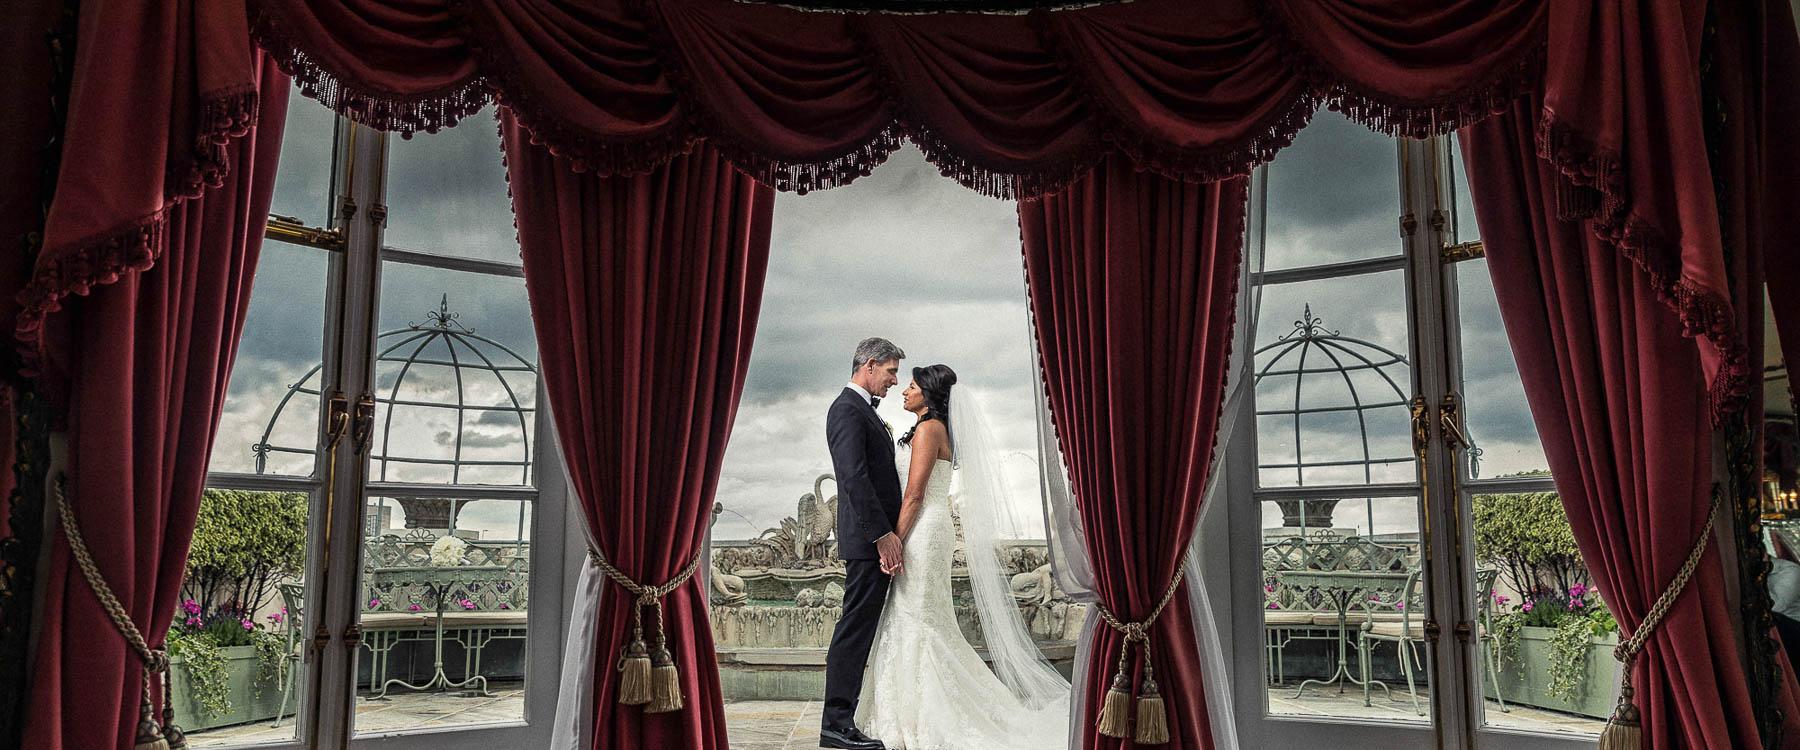 florian-photography-london-wedding-photographer-natural-30.jpg